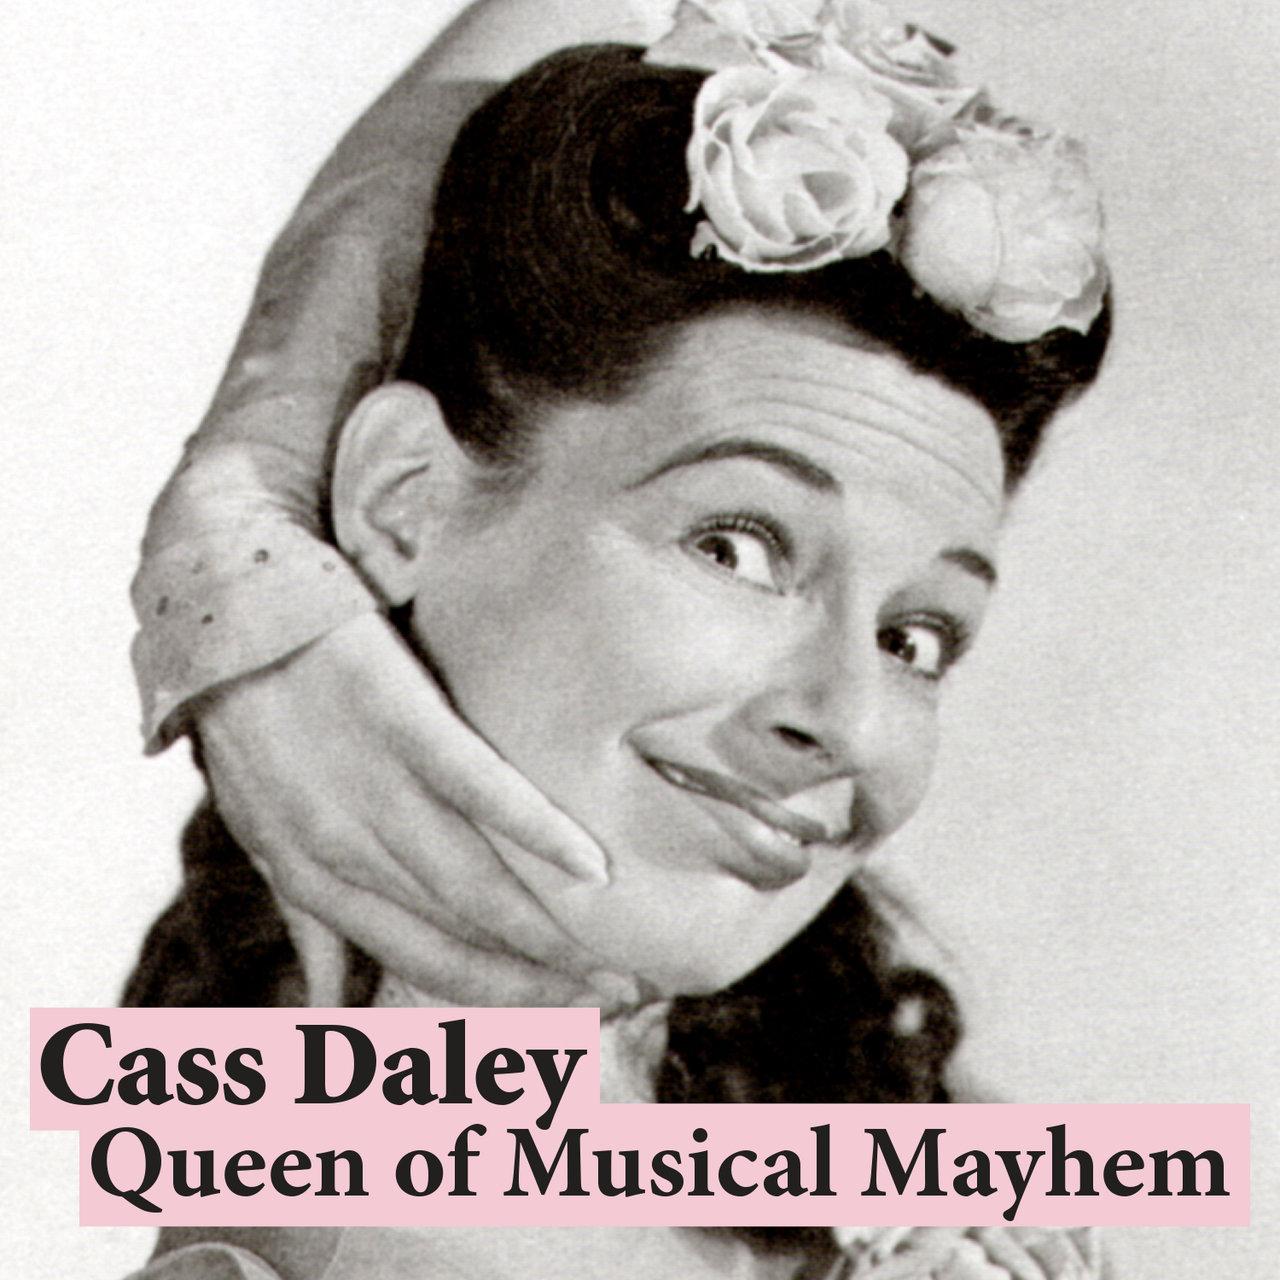 Cass Daley Cass Daley new foto